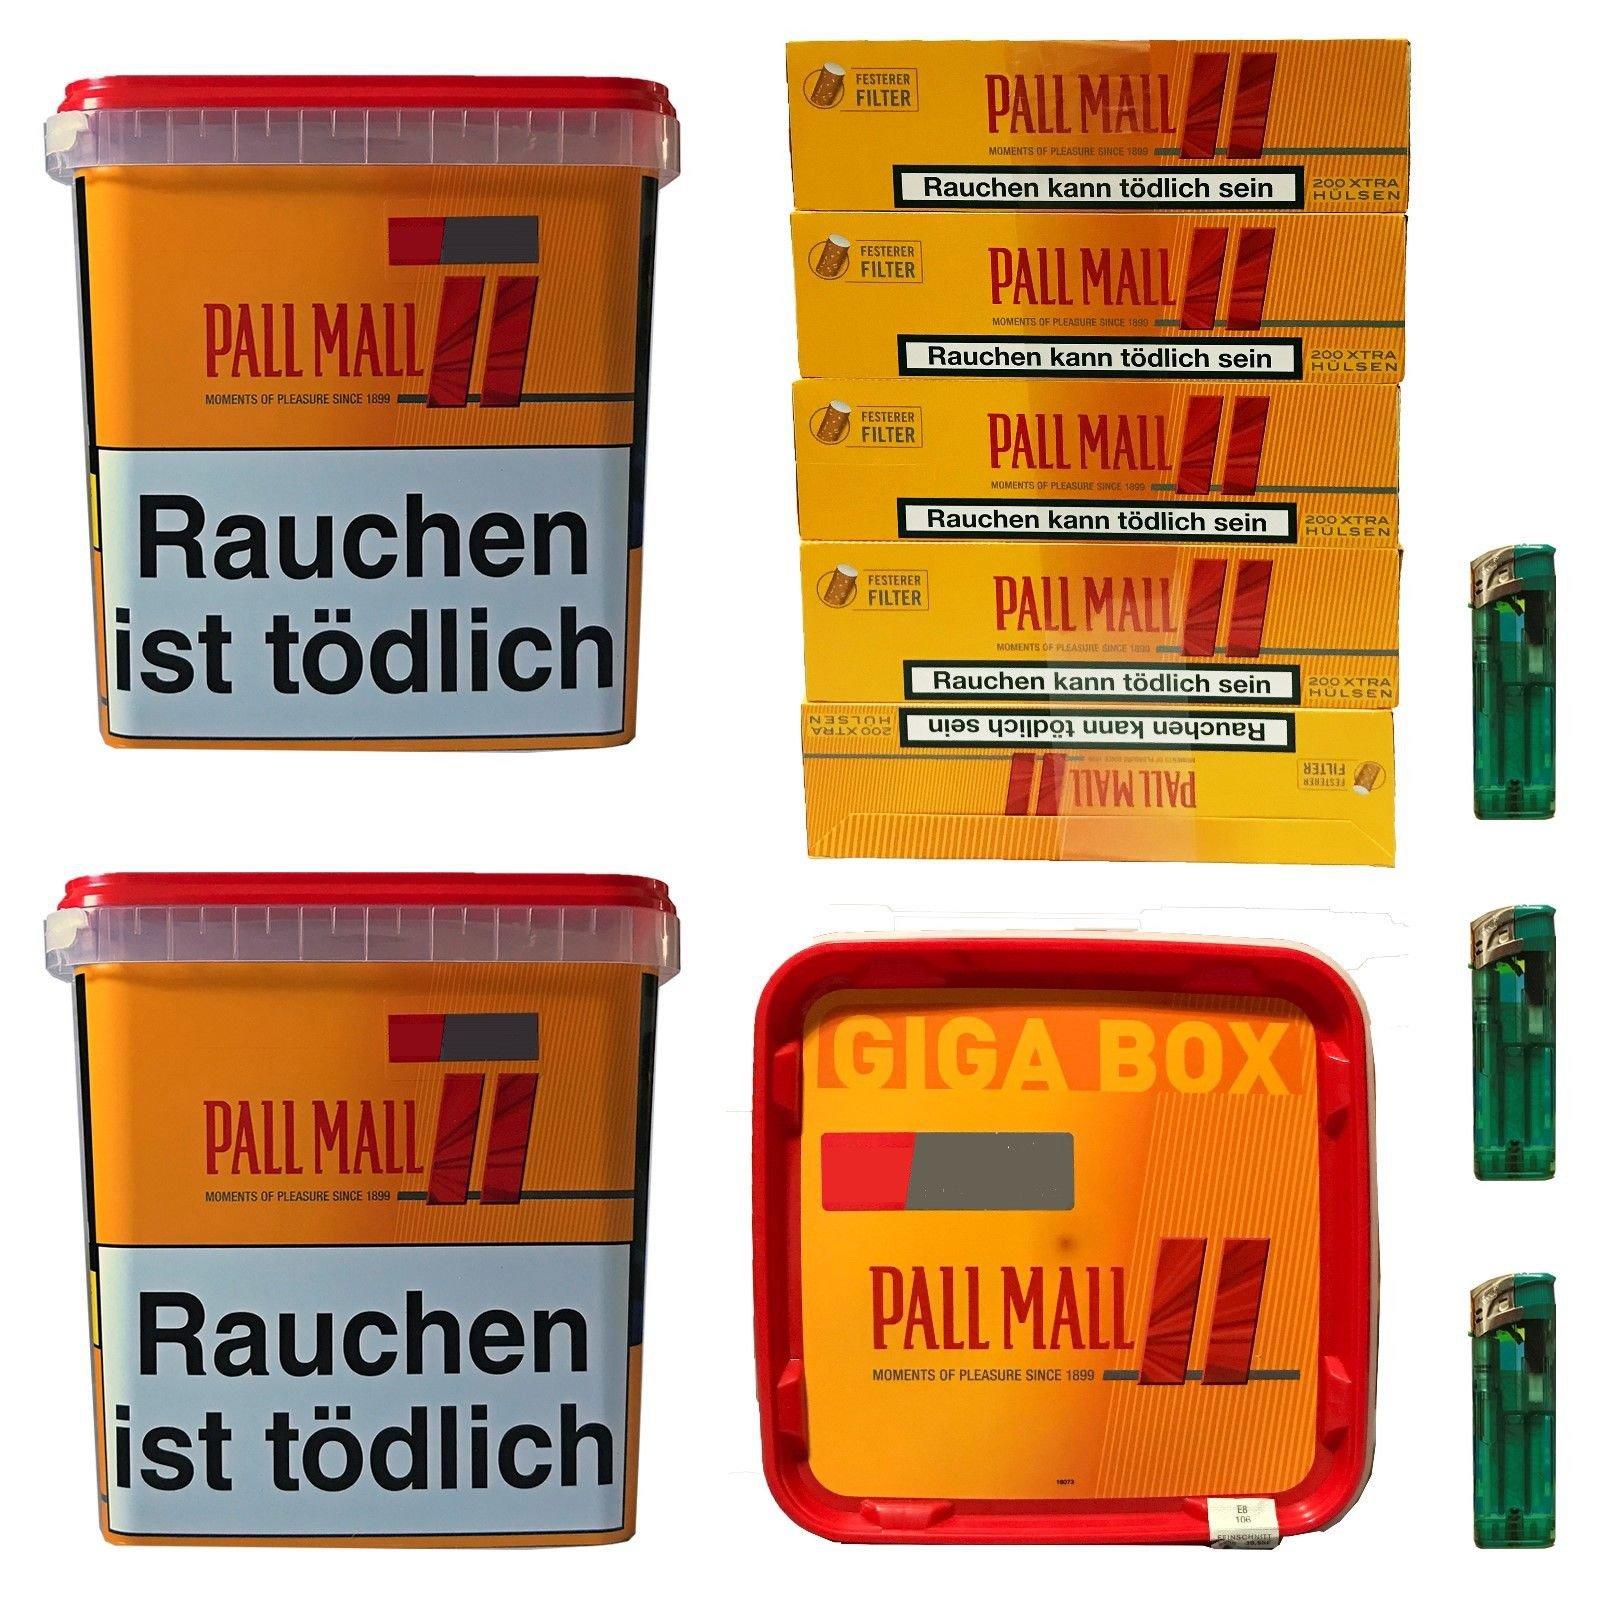 3x Pall Mall Giga Box 280 g Tabak / Volumentabak, Allround Hülsen, Feuerz